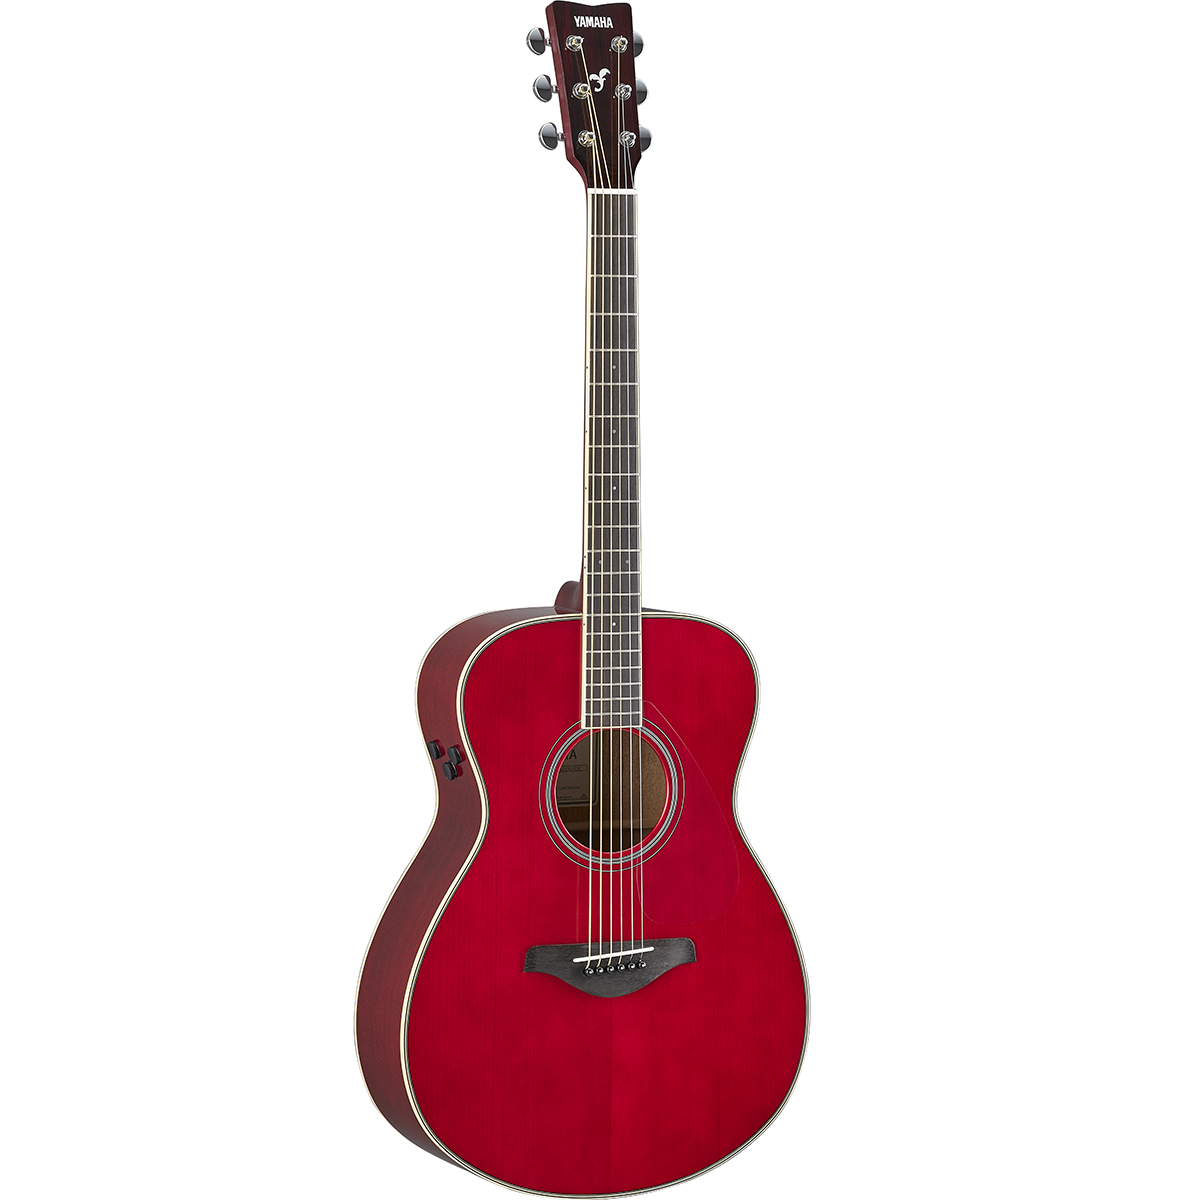 Yamaha - Guitare TransAcoustic FS-TA - Rouge